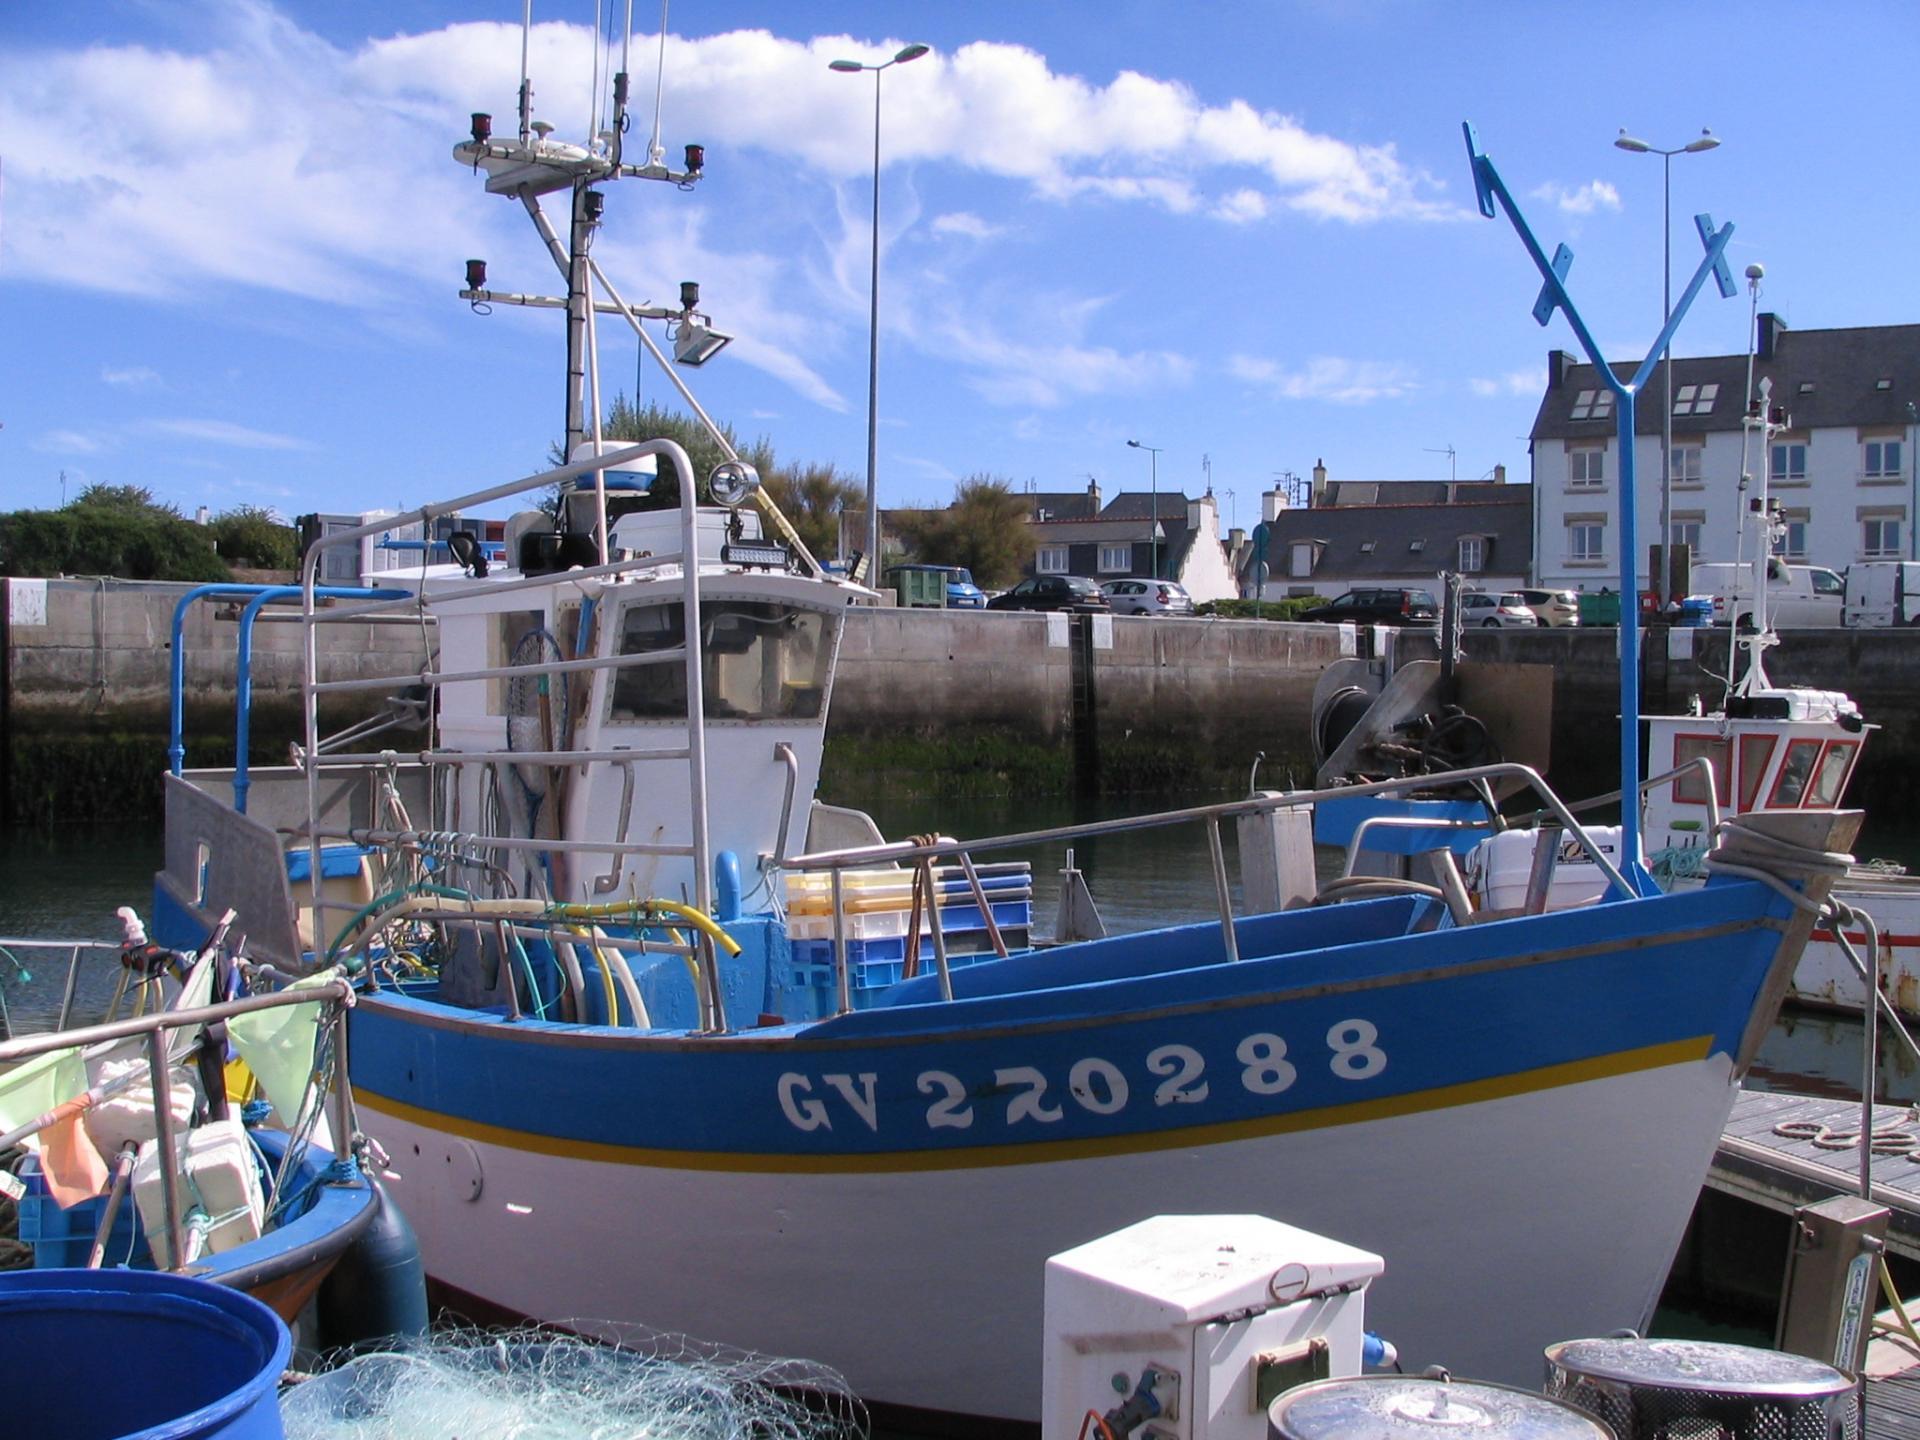 Bretagne gv270288